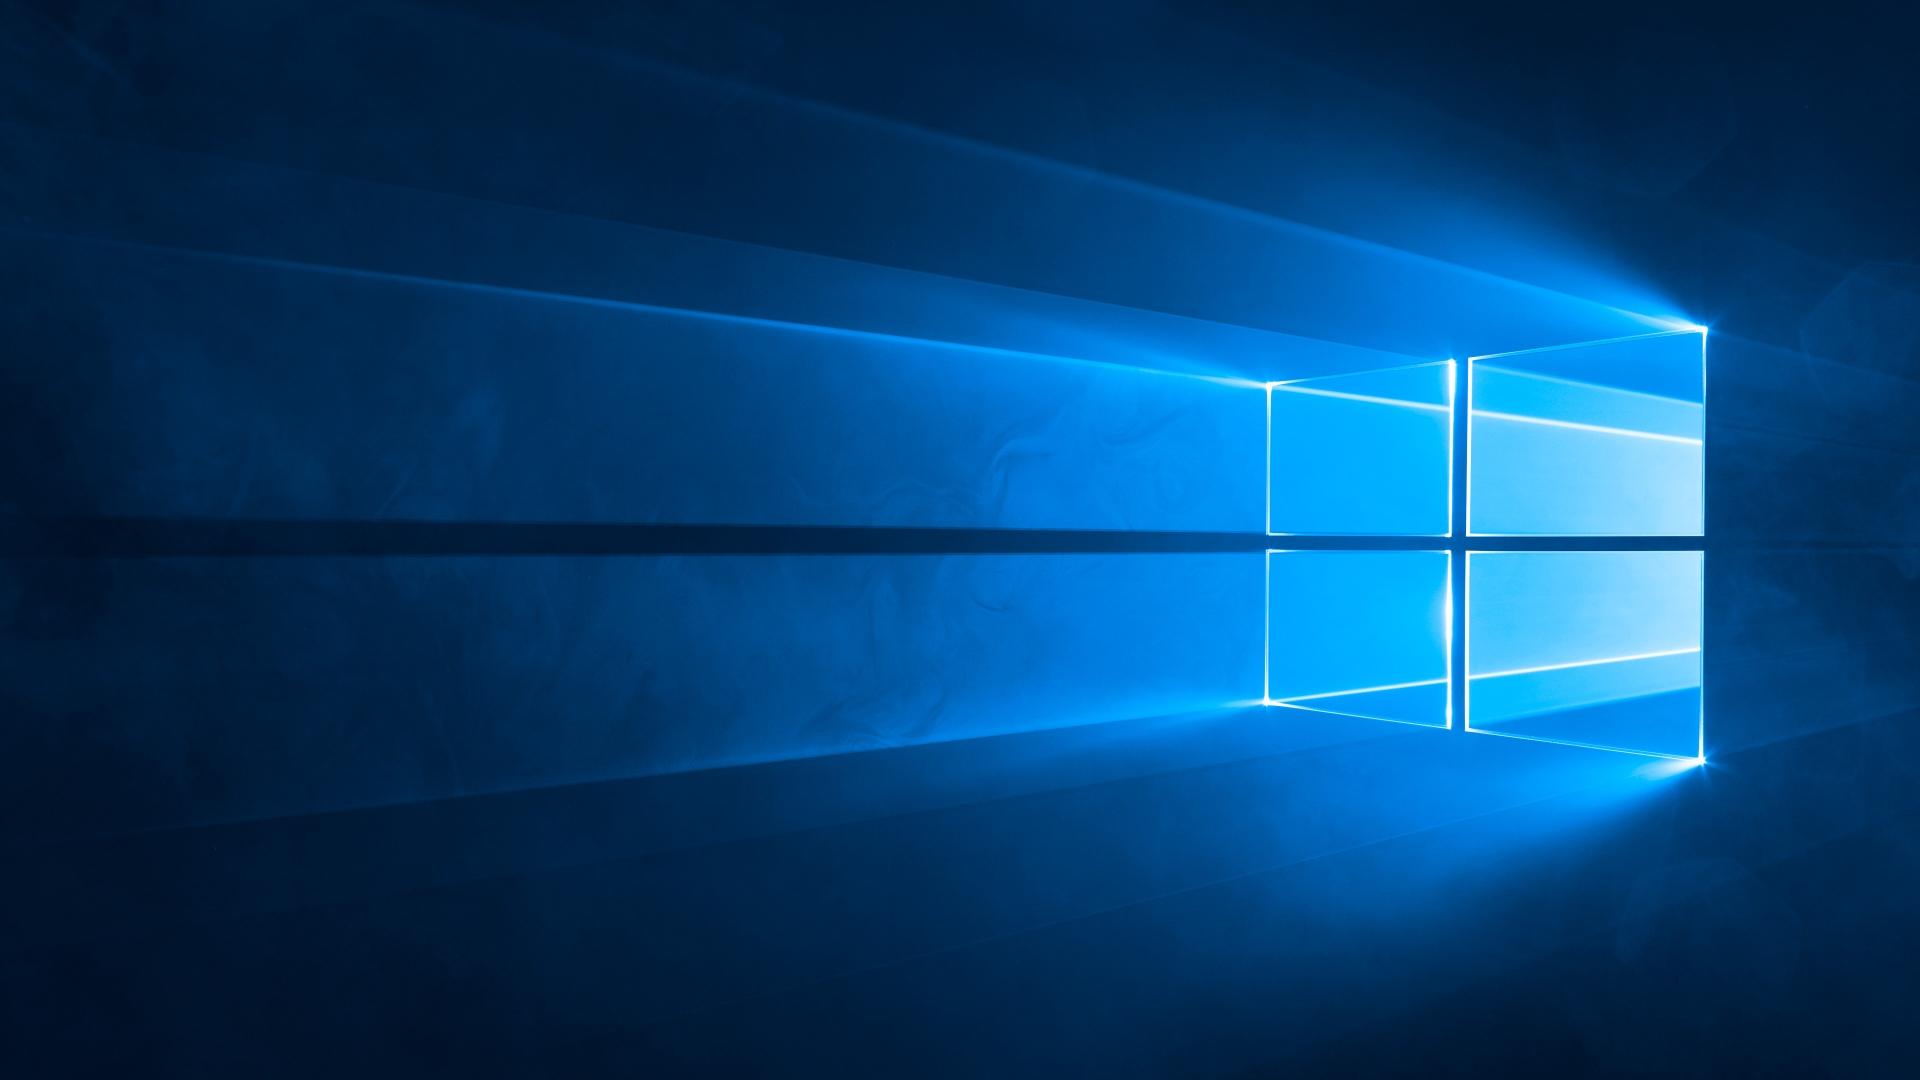 Windows 10 1080p wallpapers wallpapersafari - Windows 10 wallpaper hd 1080p ...